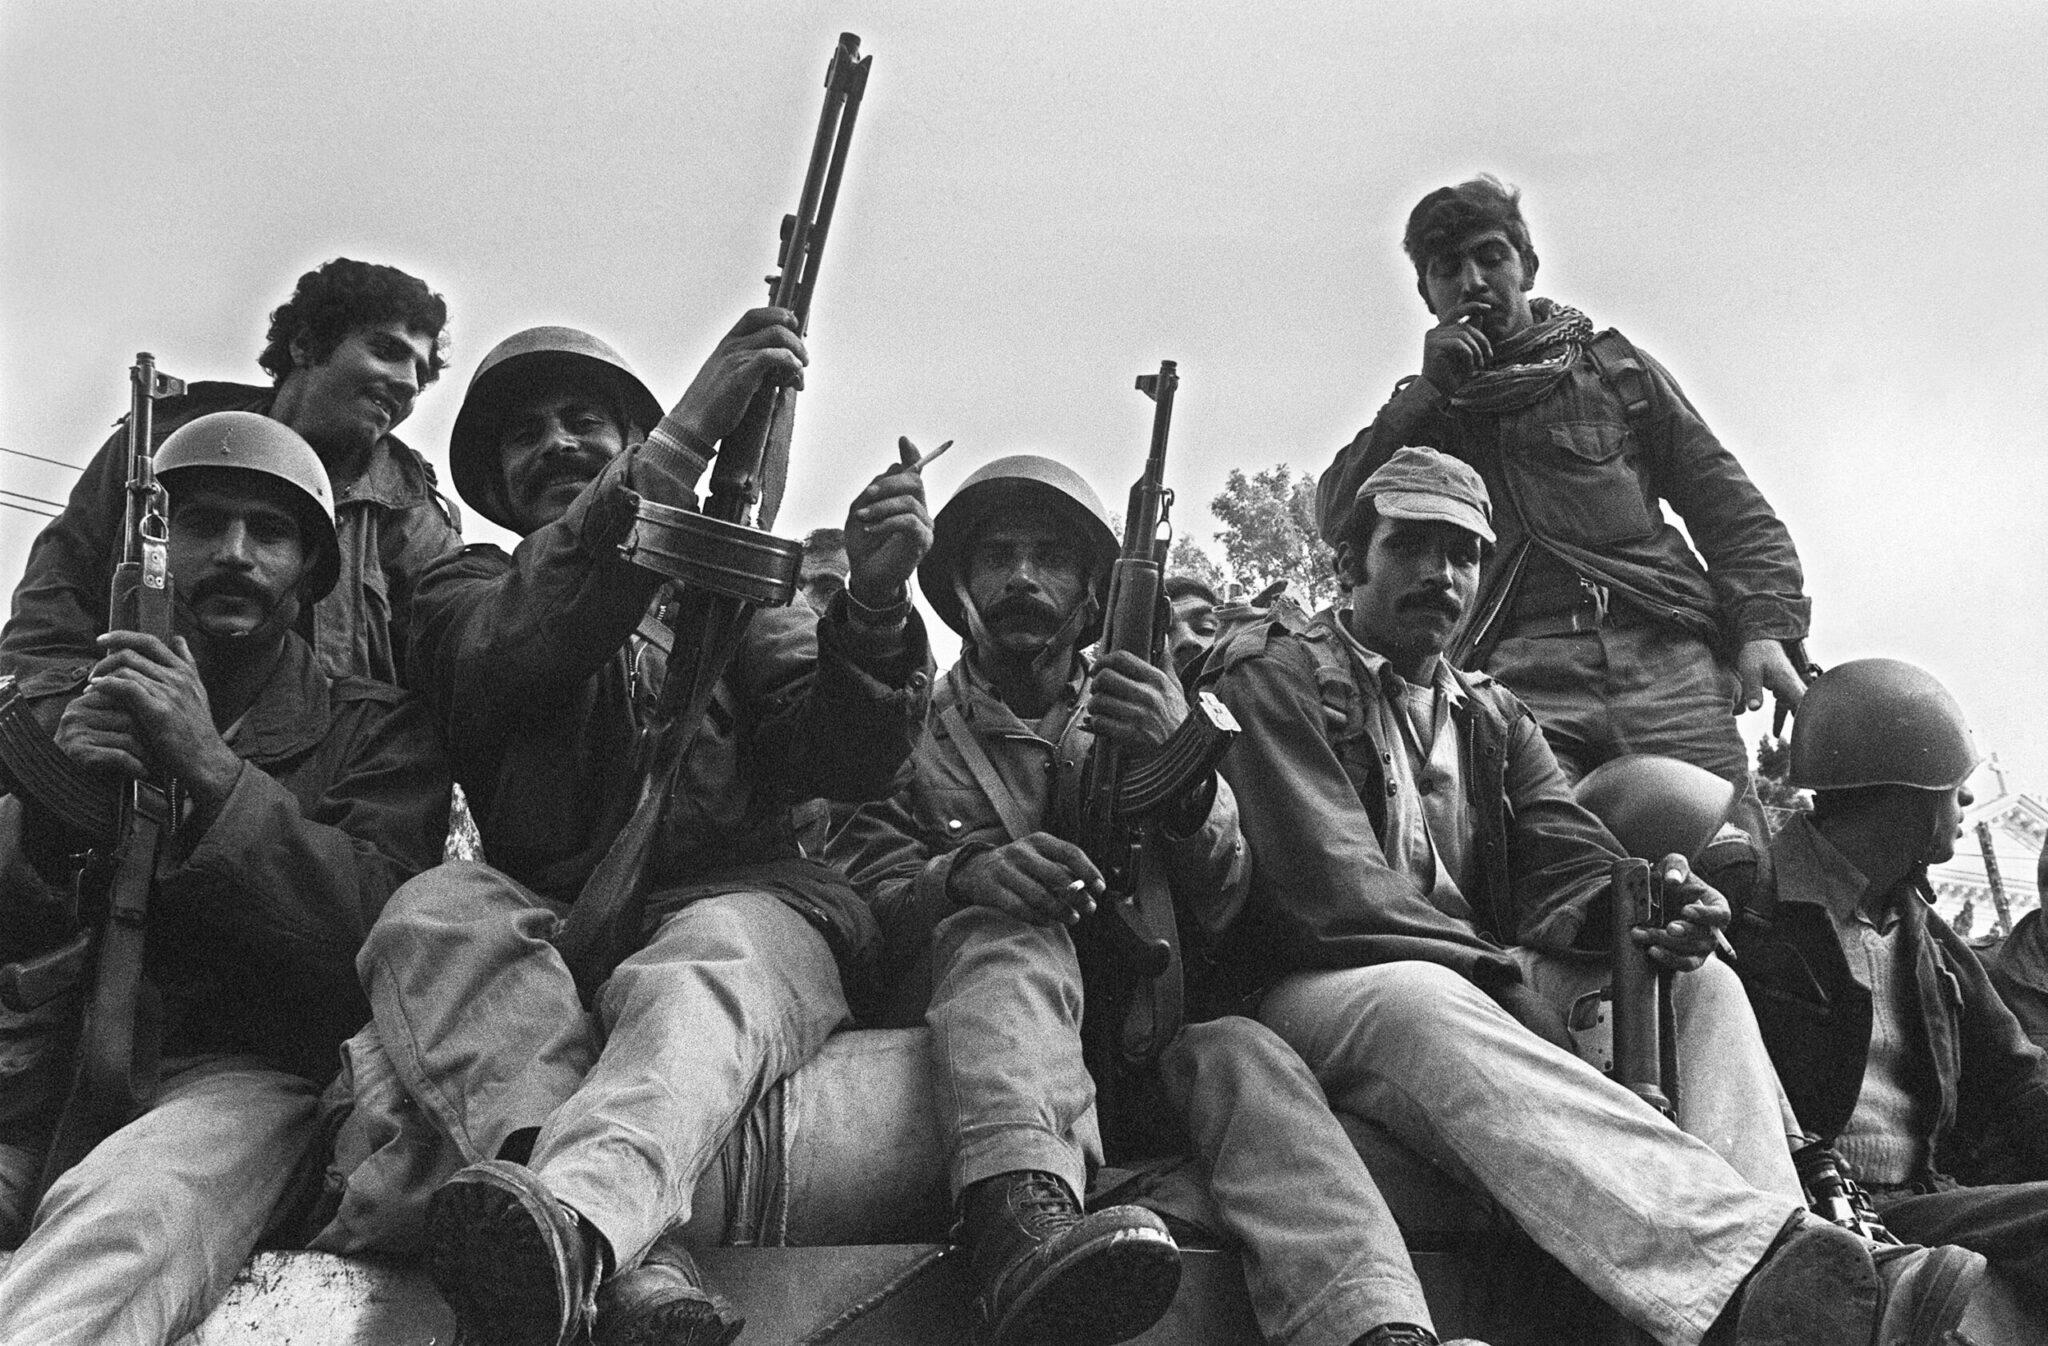 Syrian Intervention in Lebanon (1976)